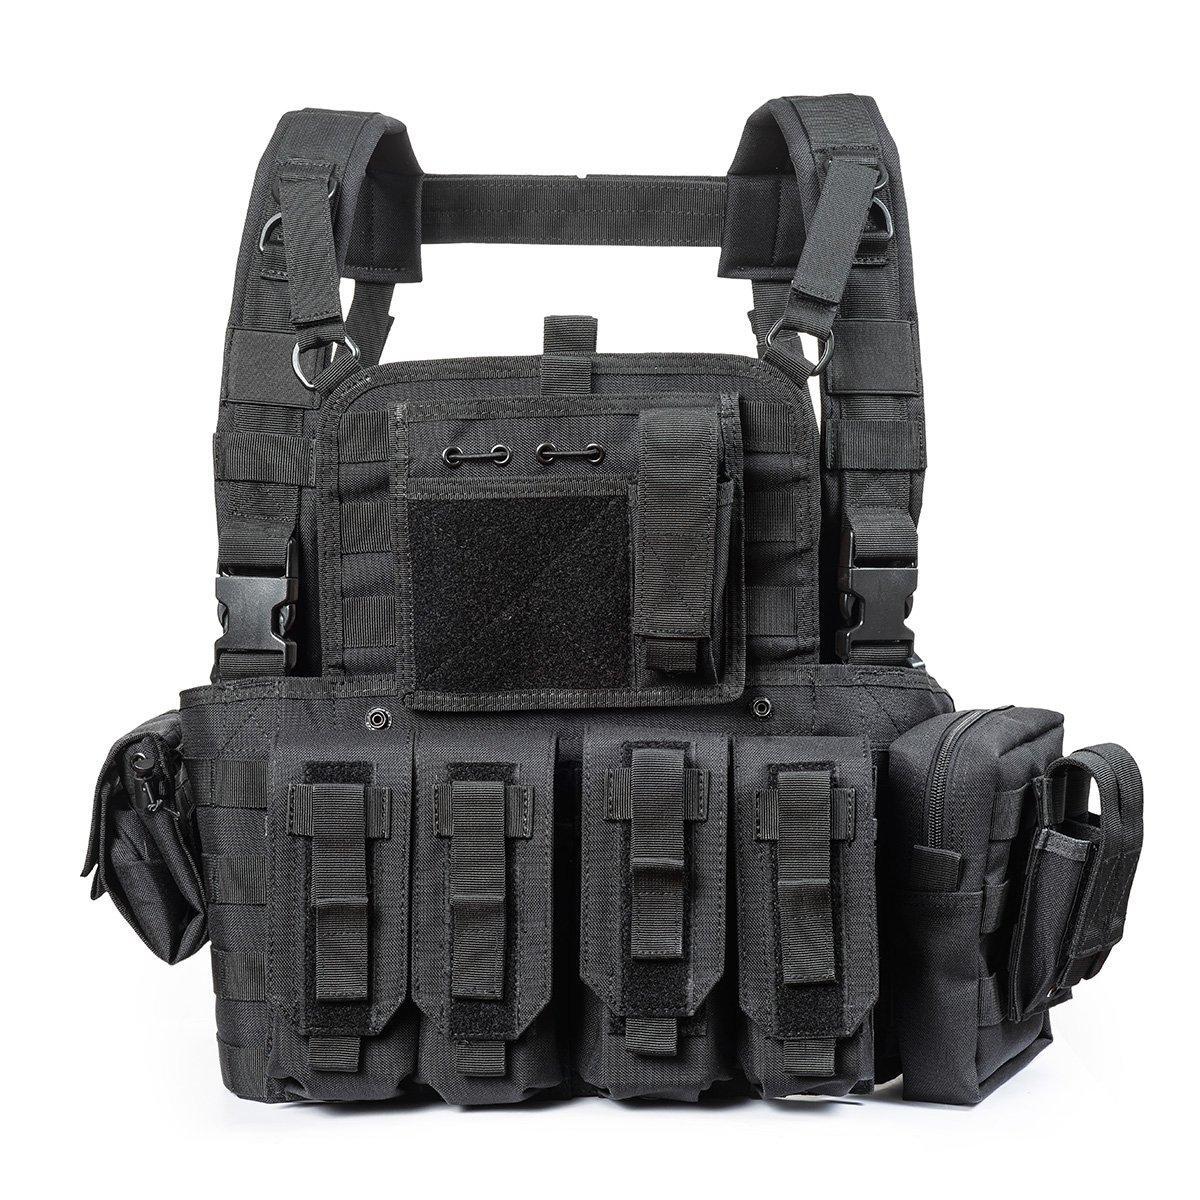 YAKEDA Tactical CS Game Chest Vest - KF-099 (Black)